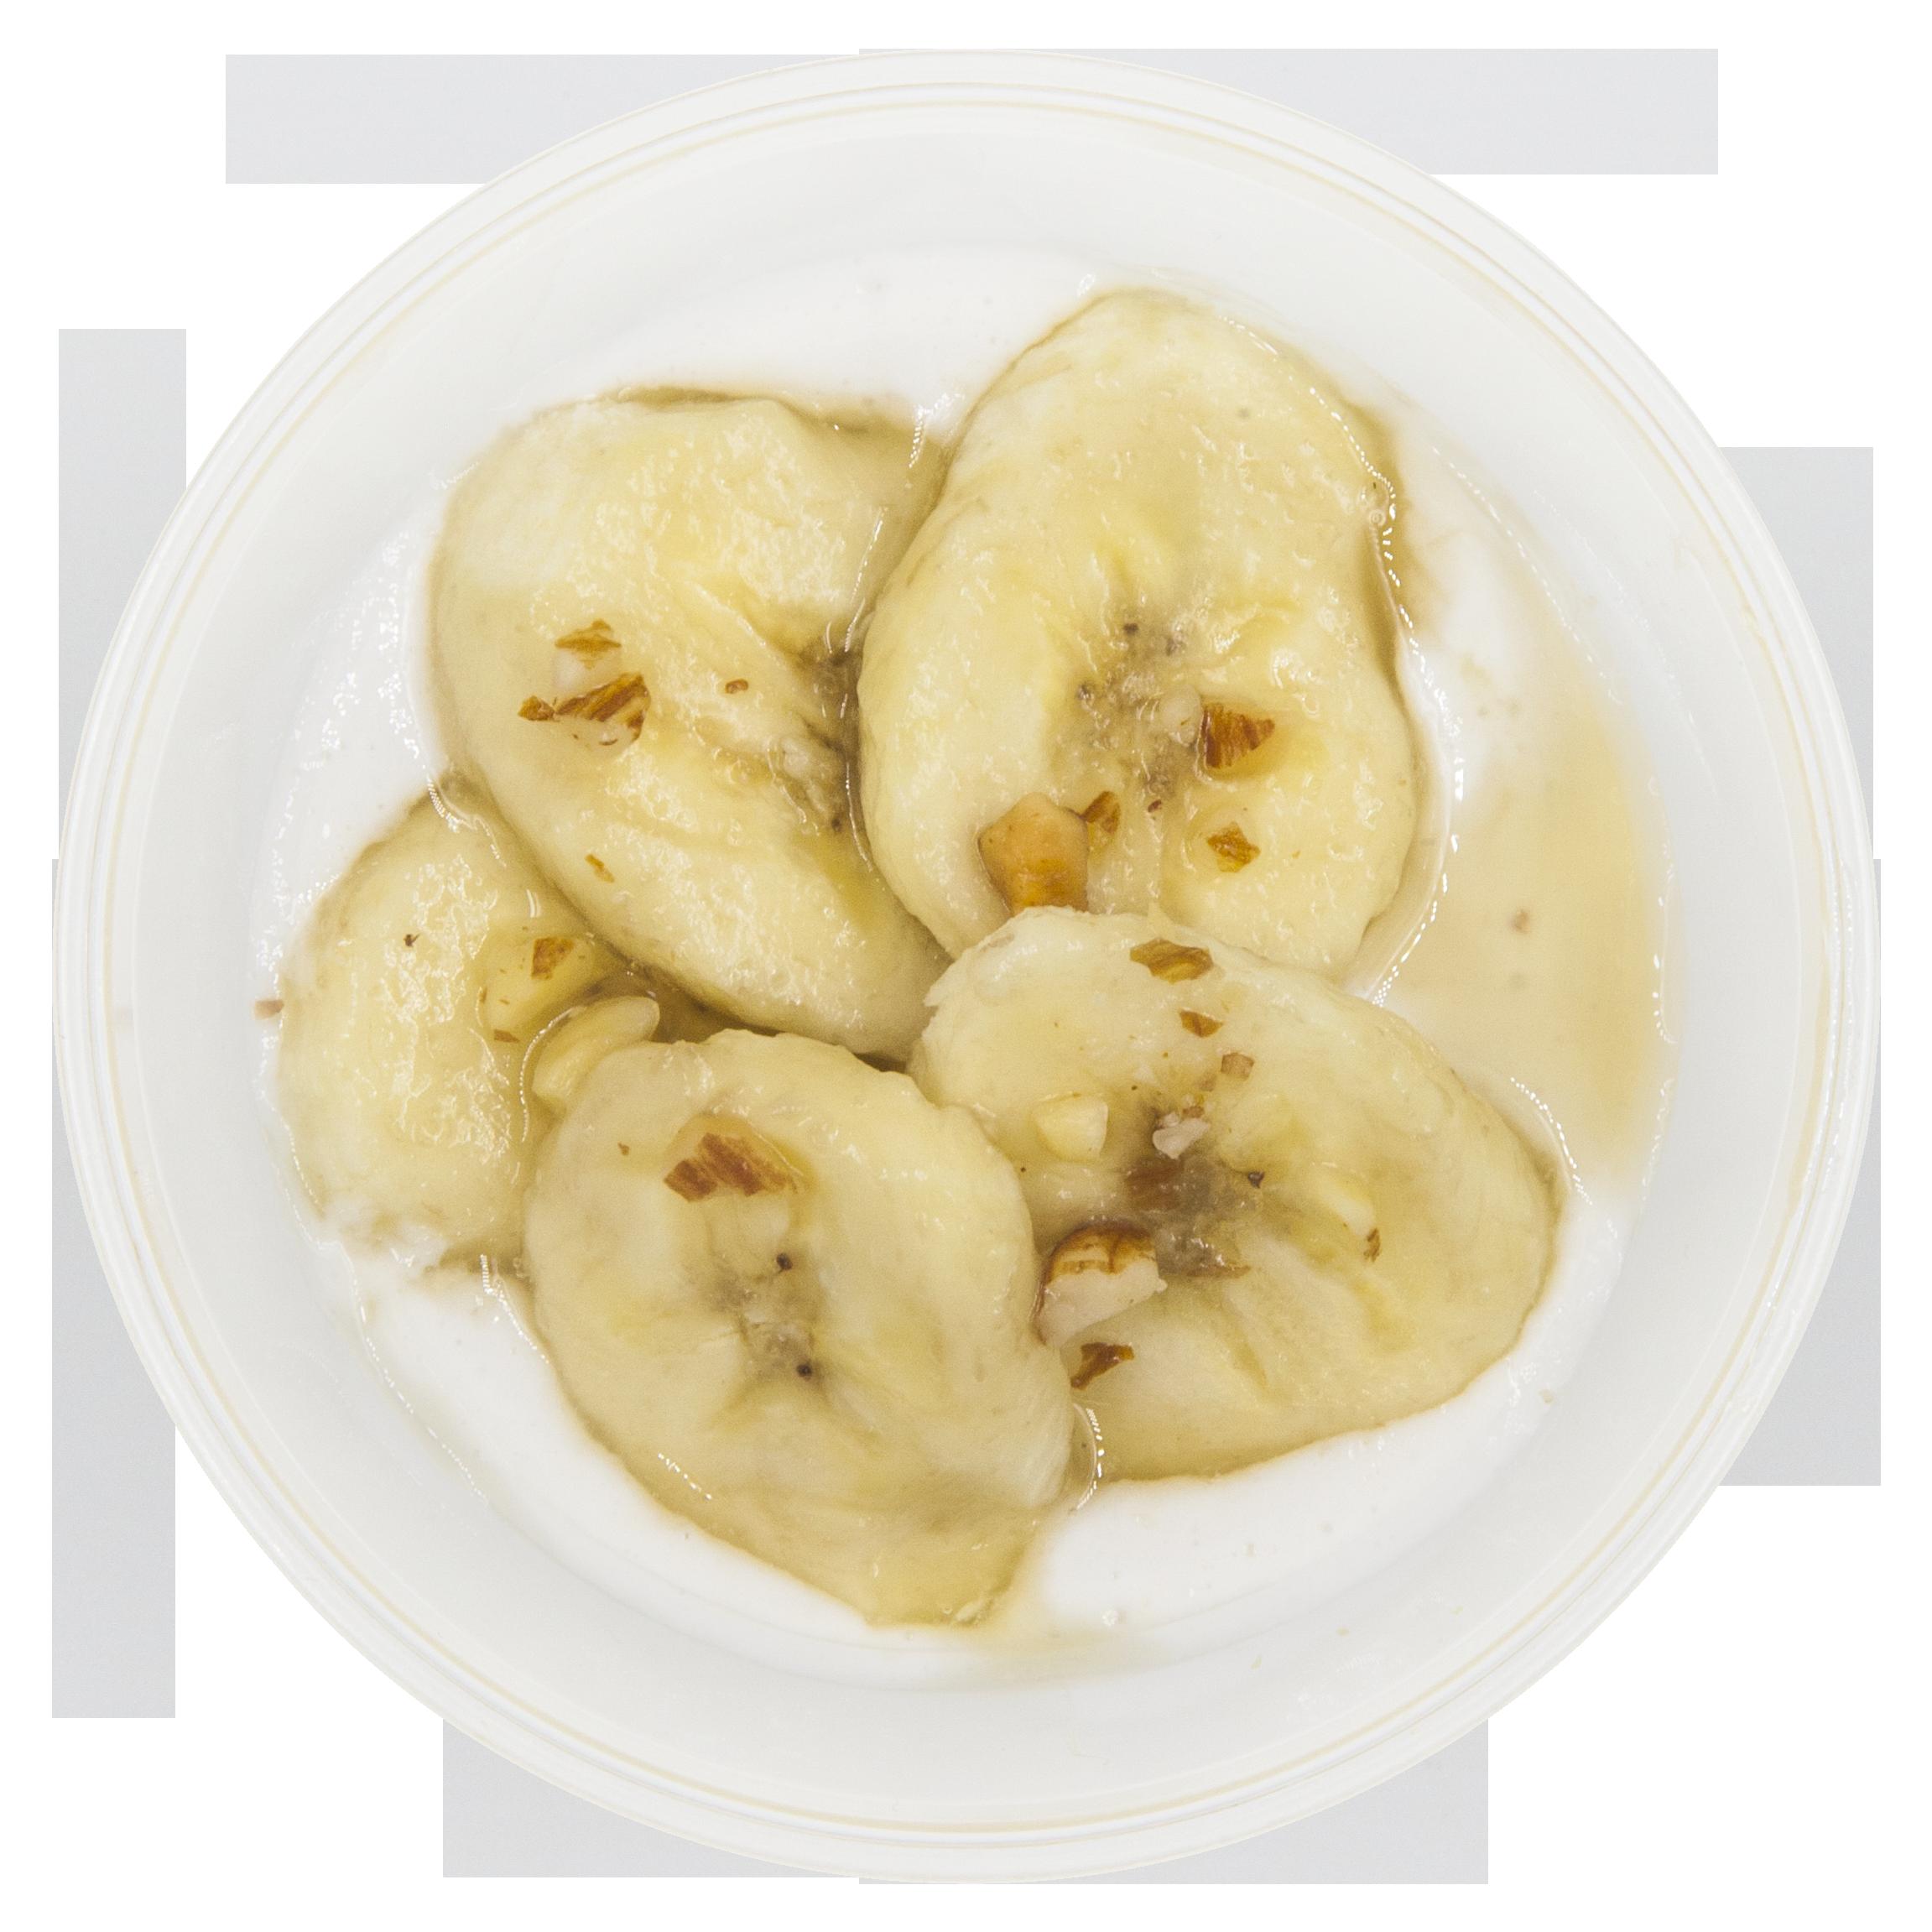 Dessert - Detox Banana Oatmeal.png